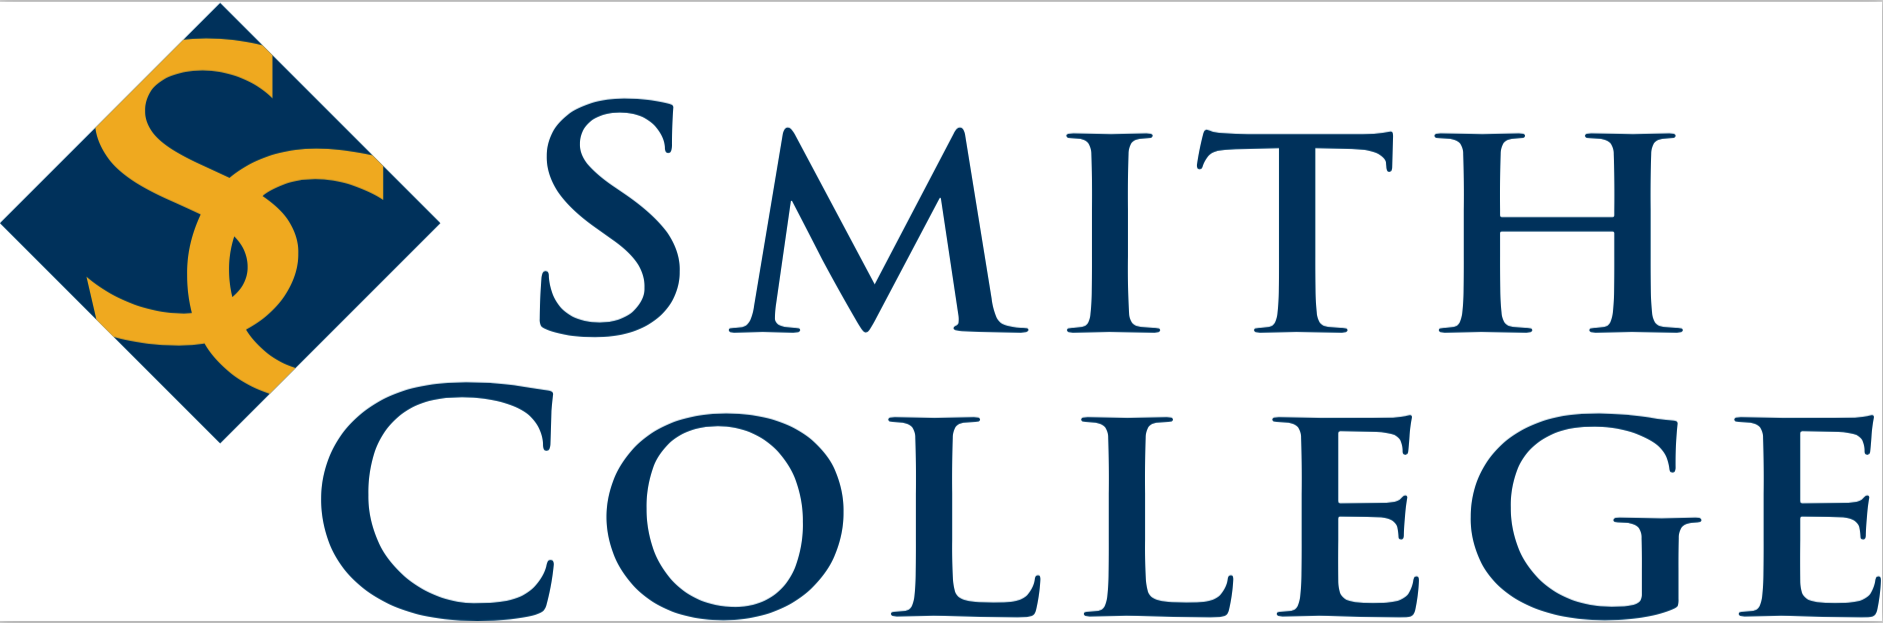 SmithLogoStack-cmyk.png